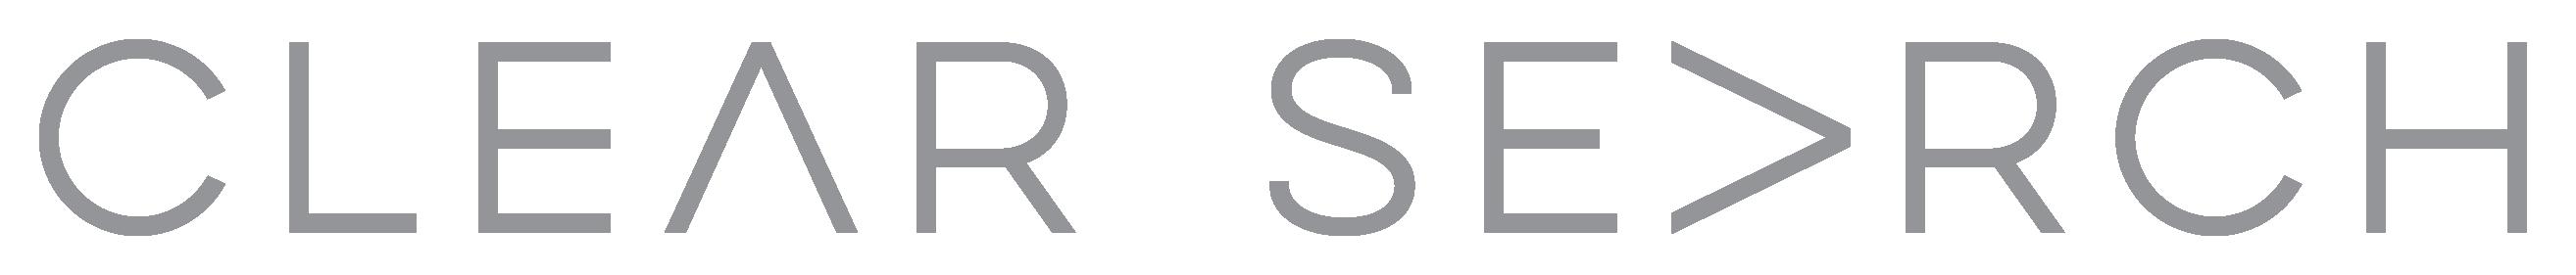 Clear Search logo